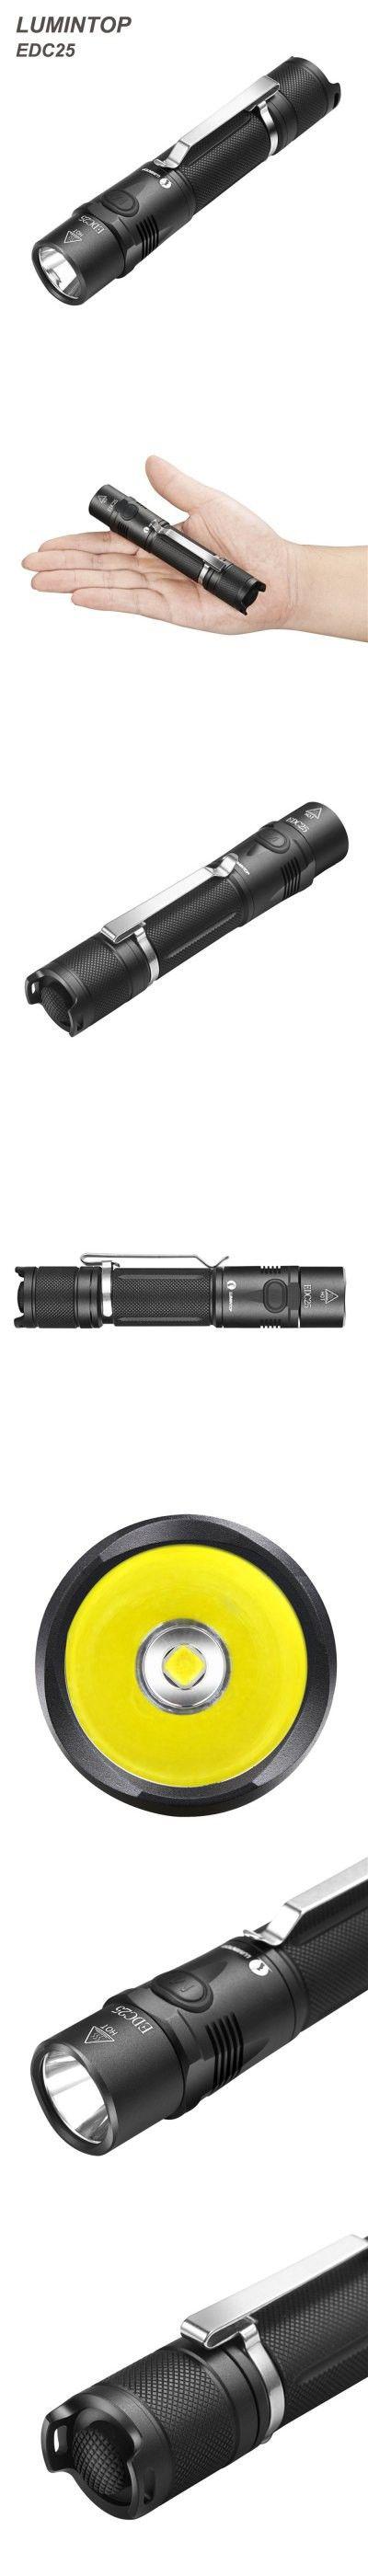 LUMINTOP EDC25 Rechargeable LED Flashlight